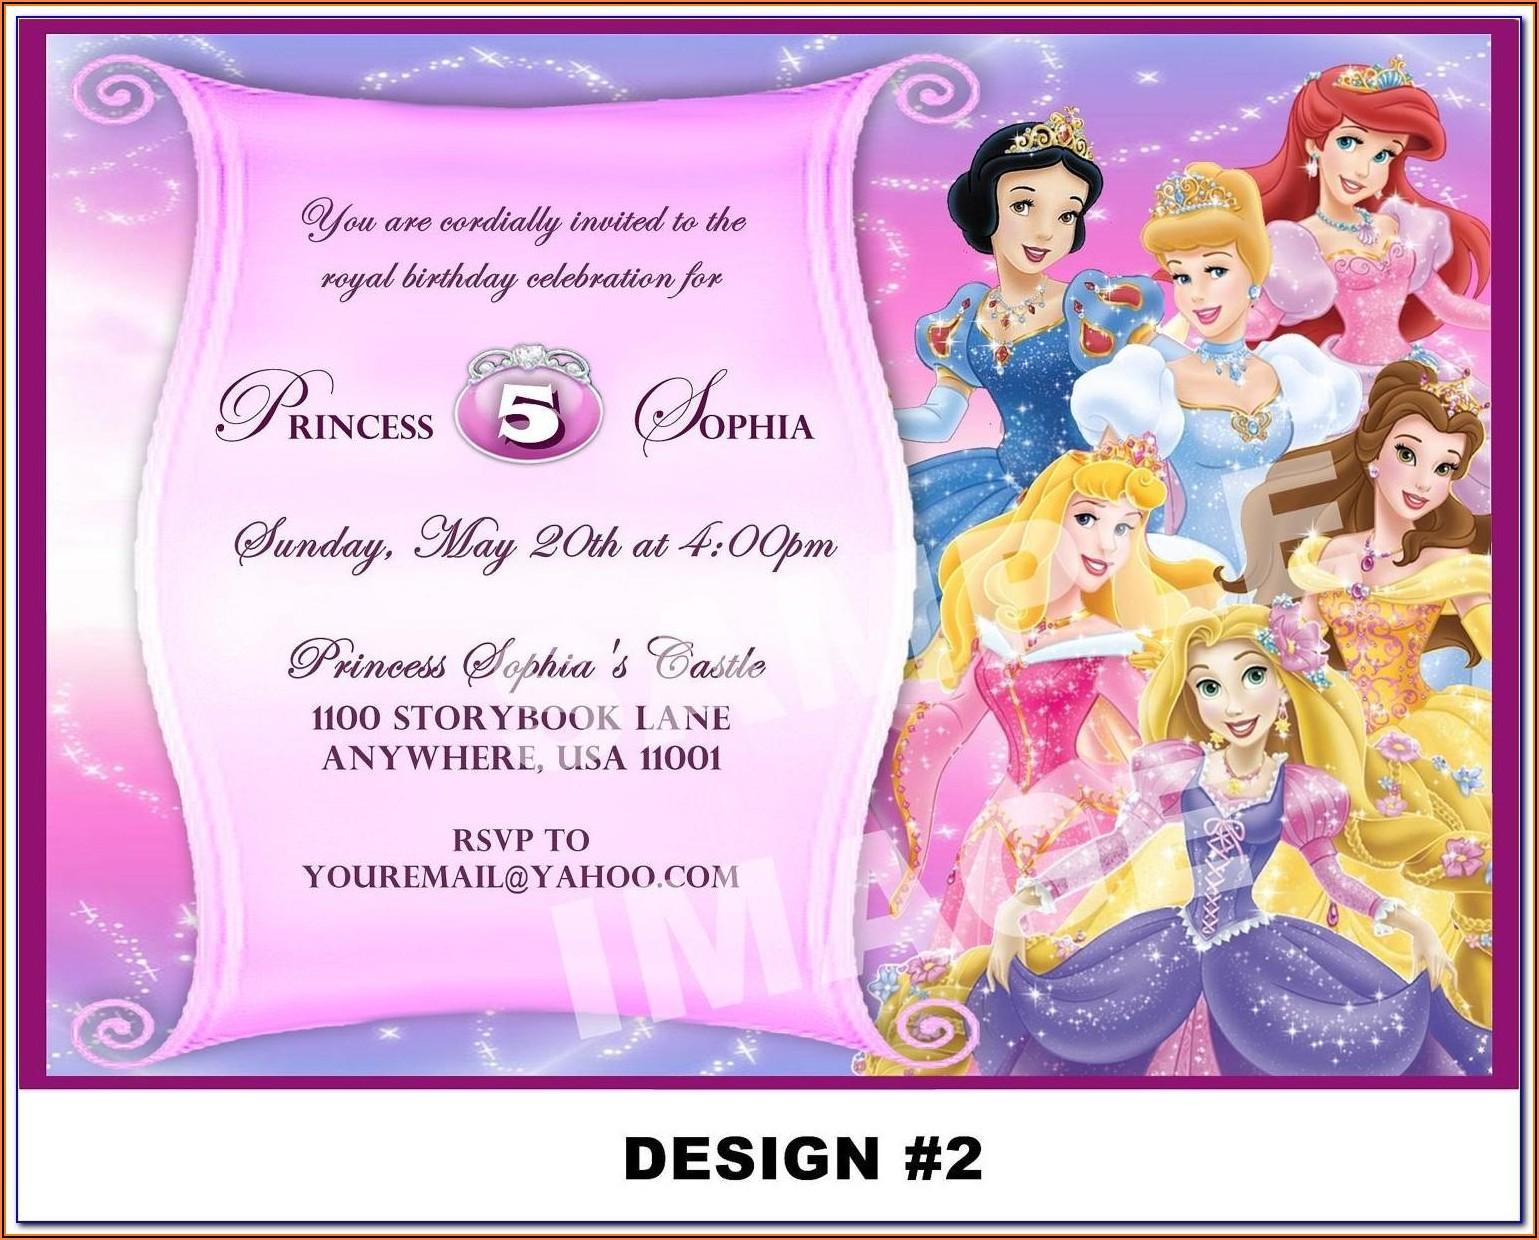 Princess Sofia Invitations Template Free